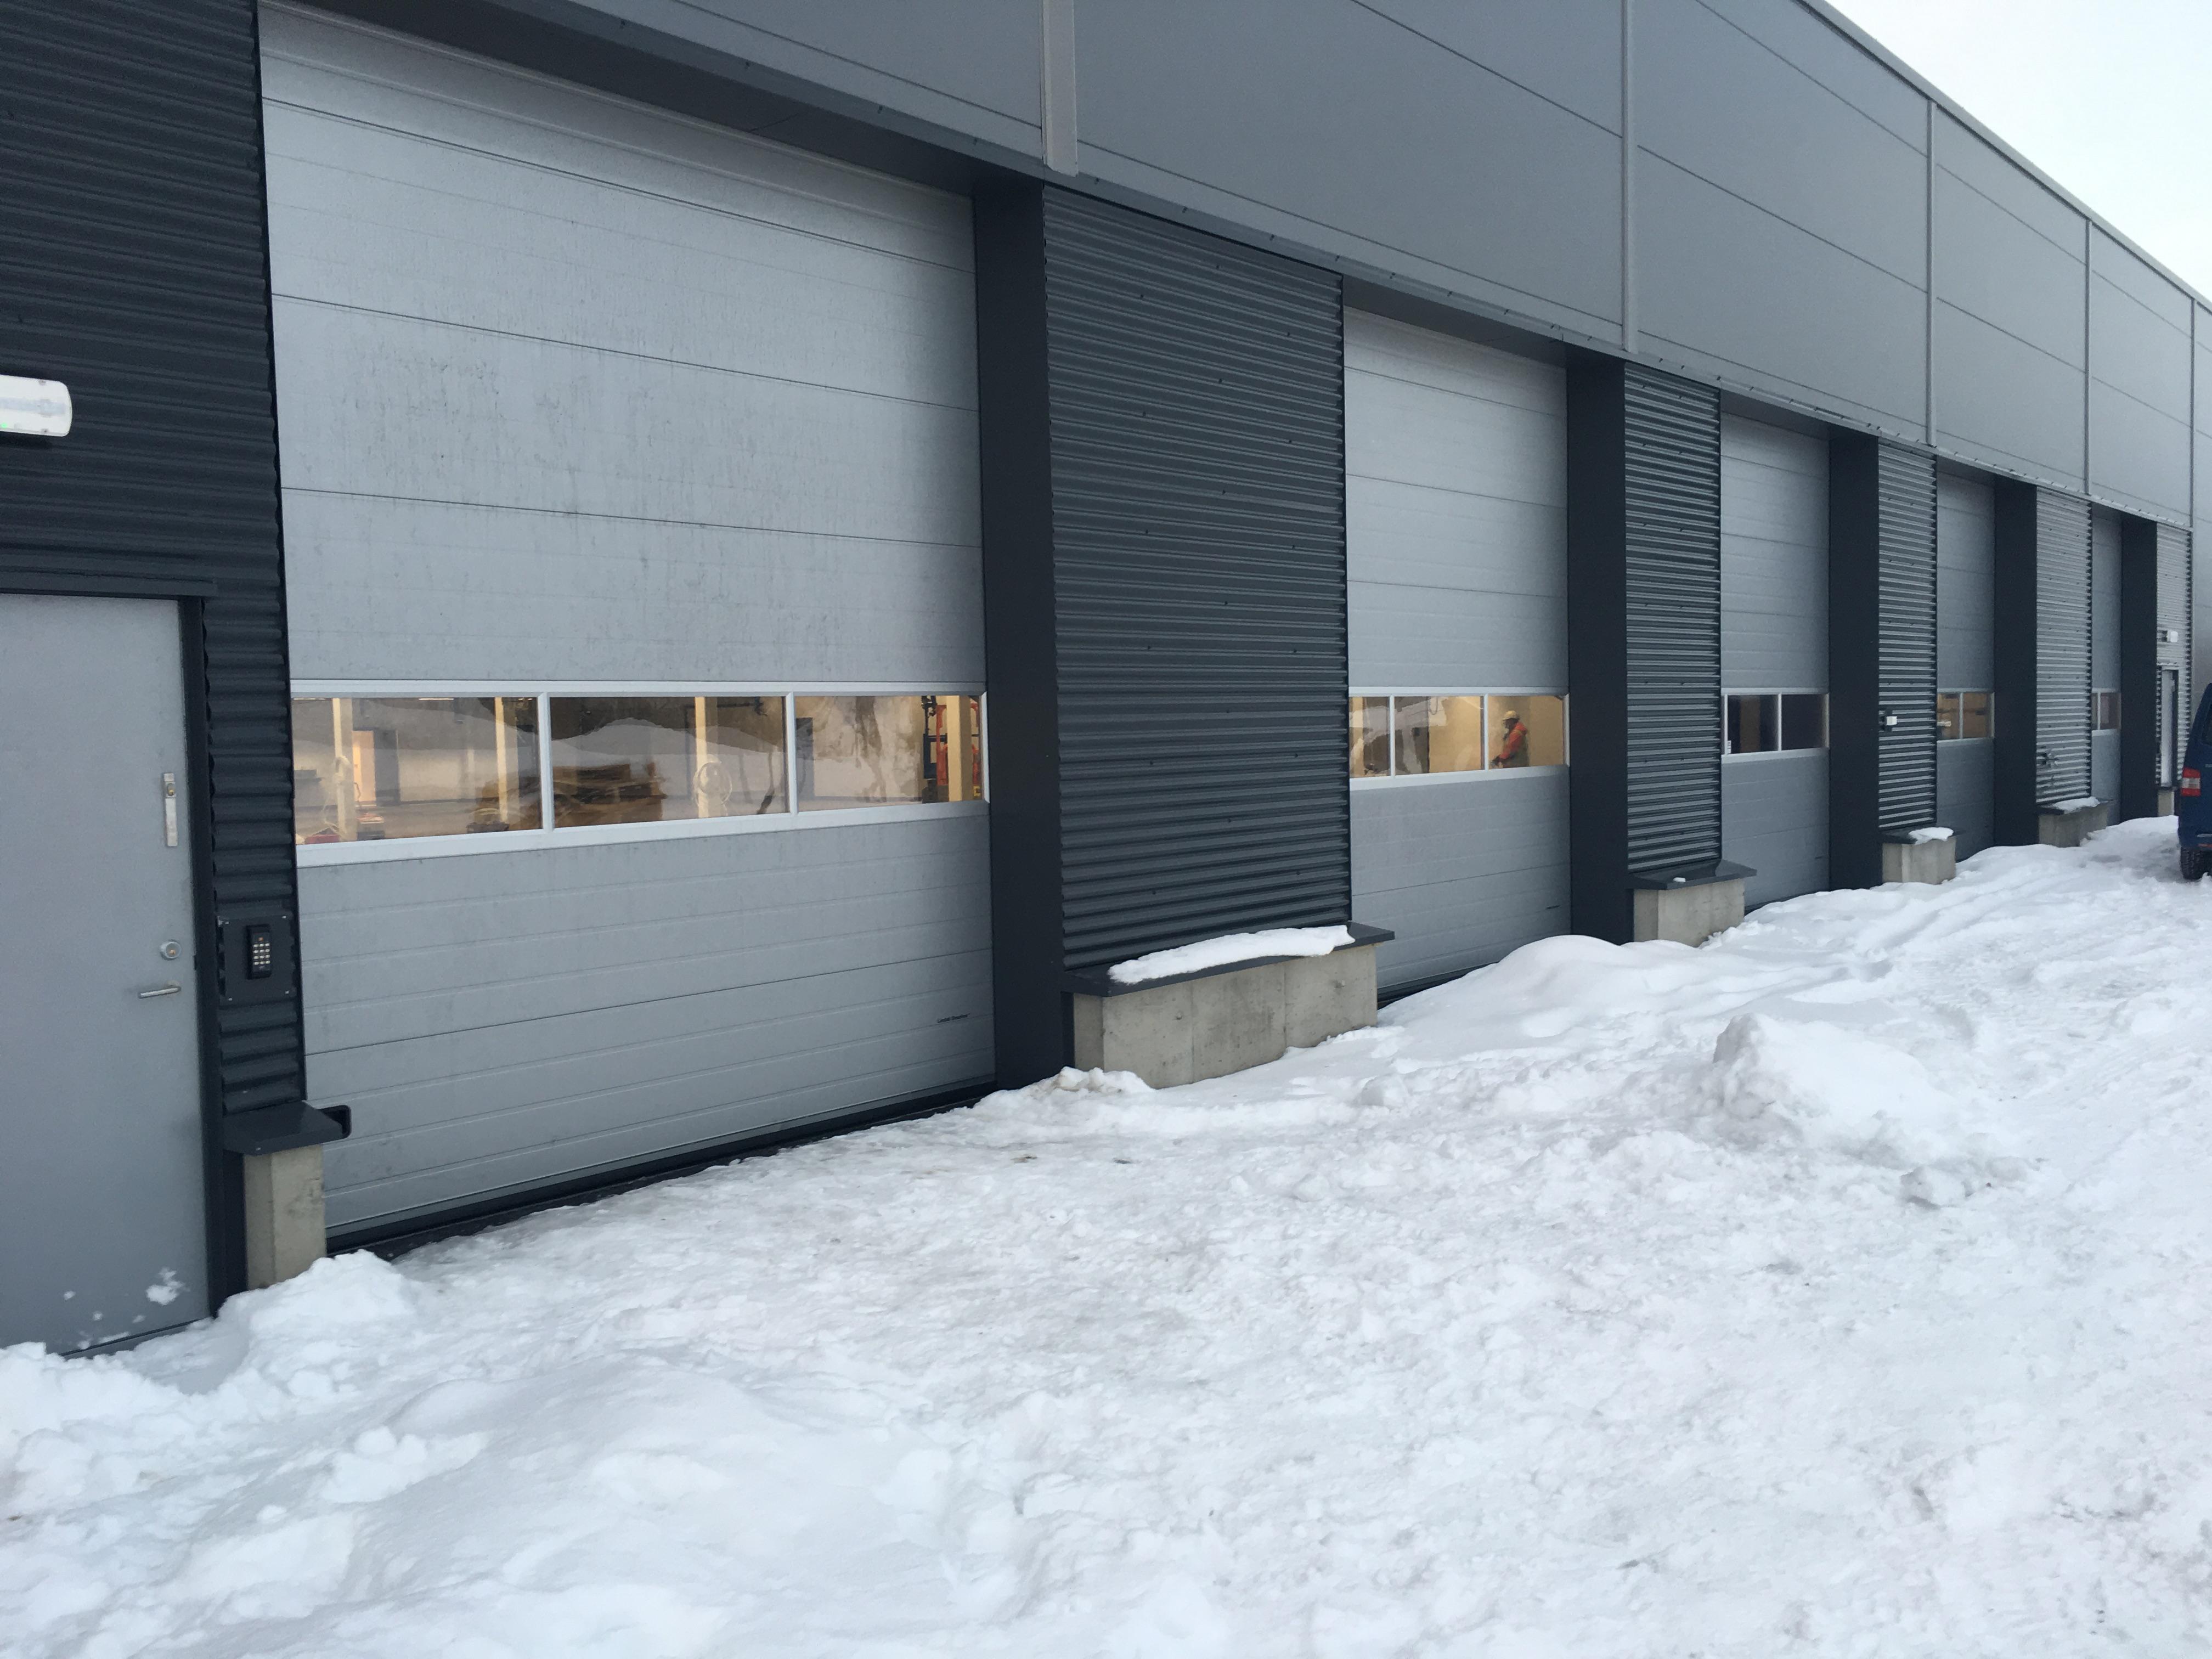 Sulland Tromsø